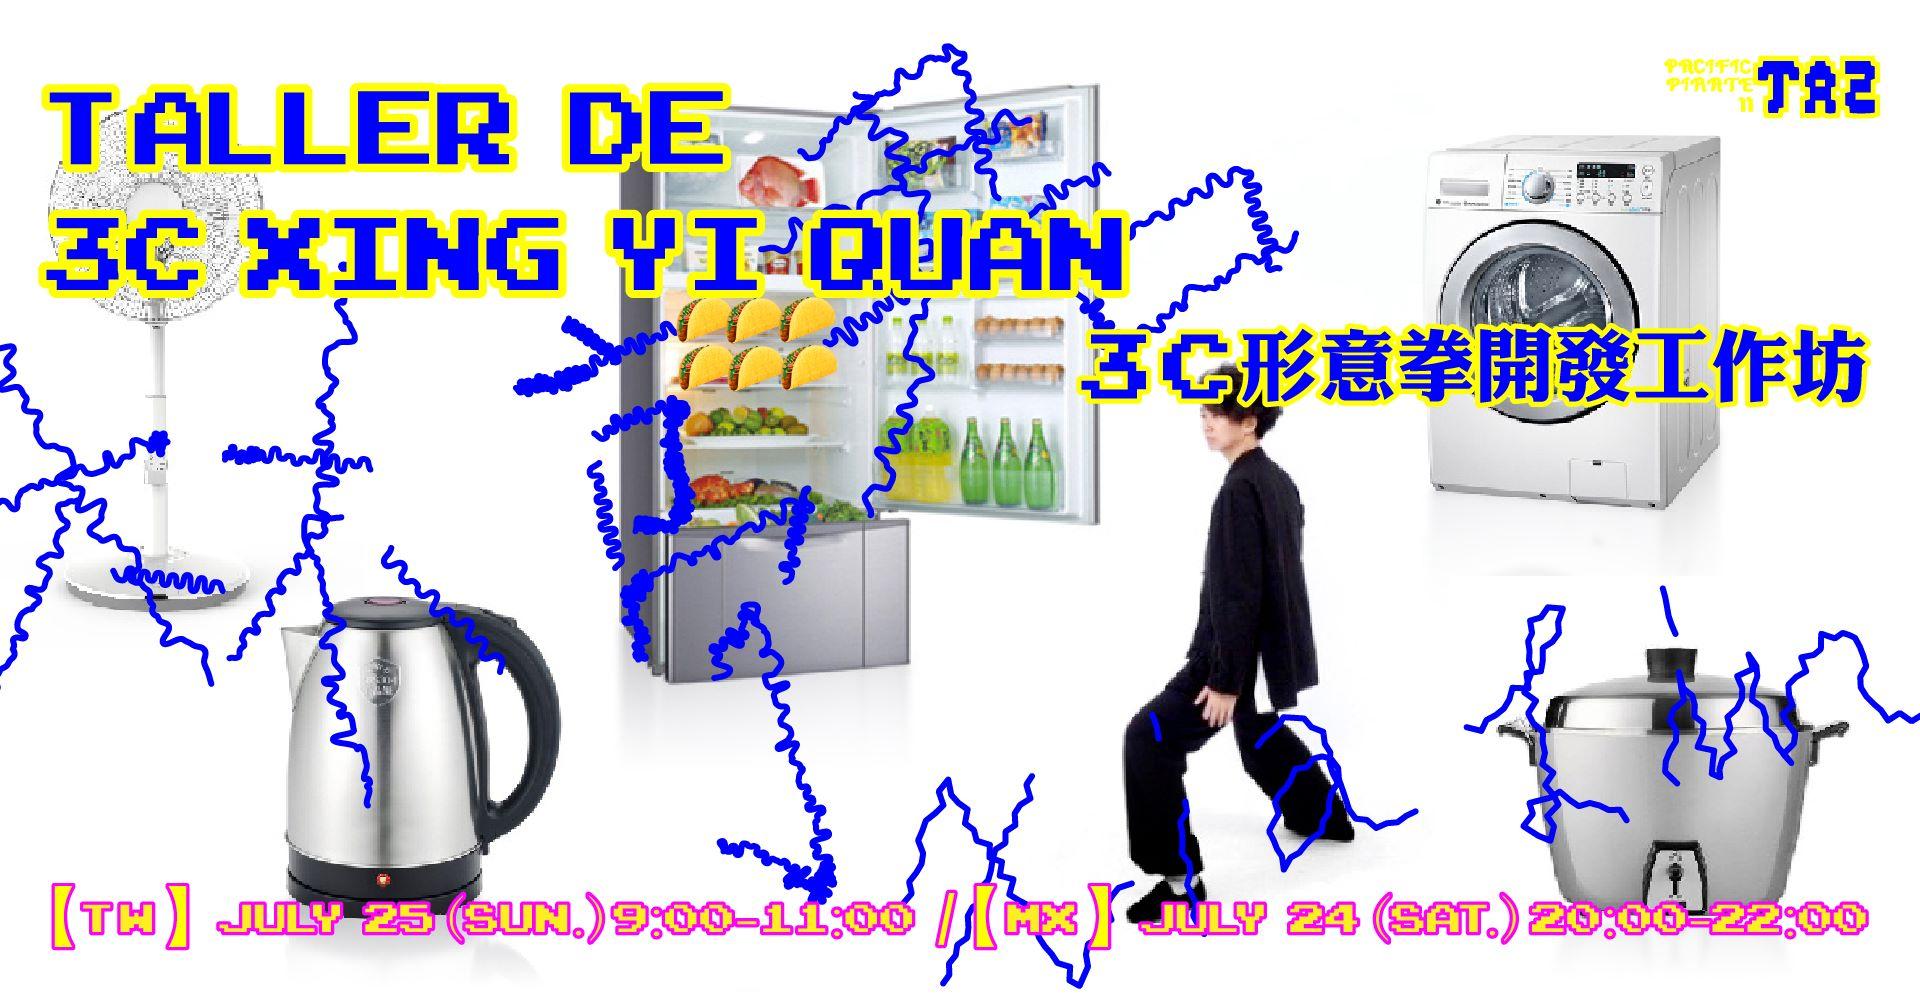 PP#2:TAZ【Performance / Actuar】Workshop of 3C Xing Yi Quan / Taller de 3C Xing Yi Quan|Xia Lin